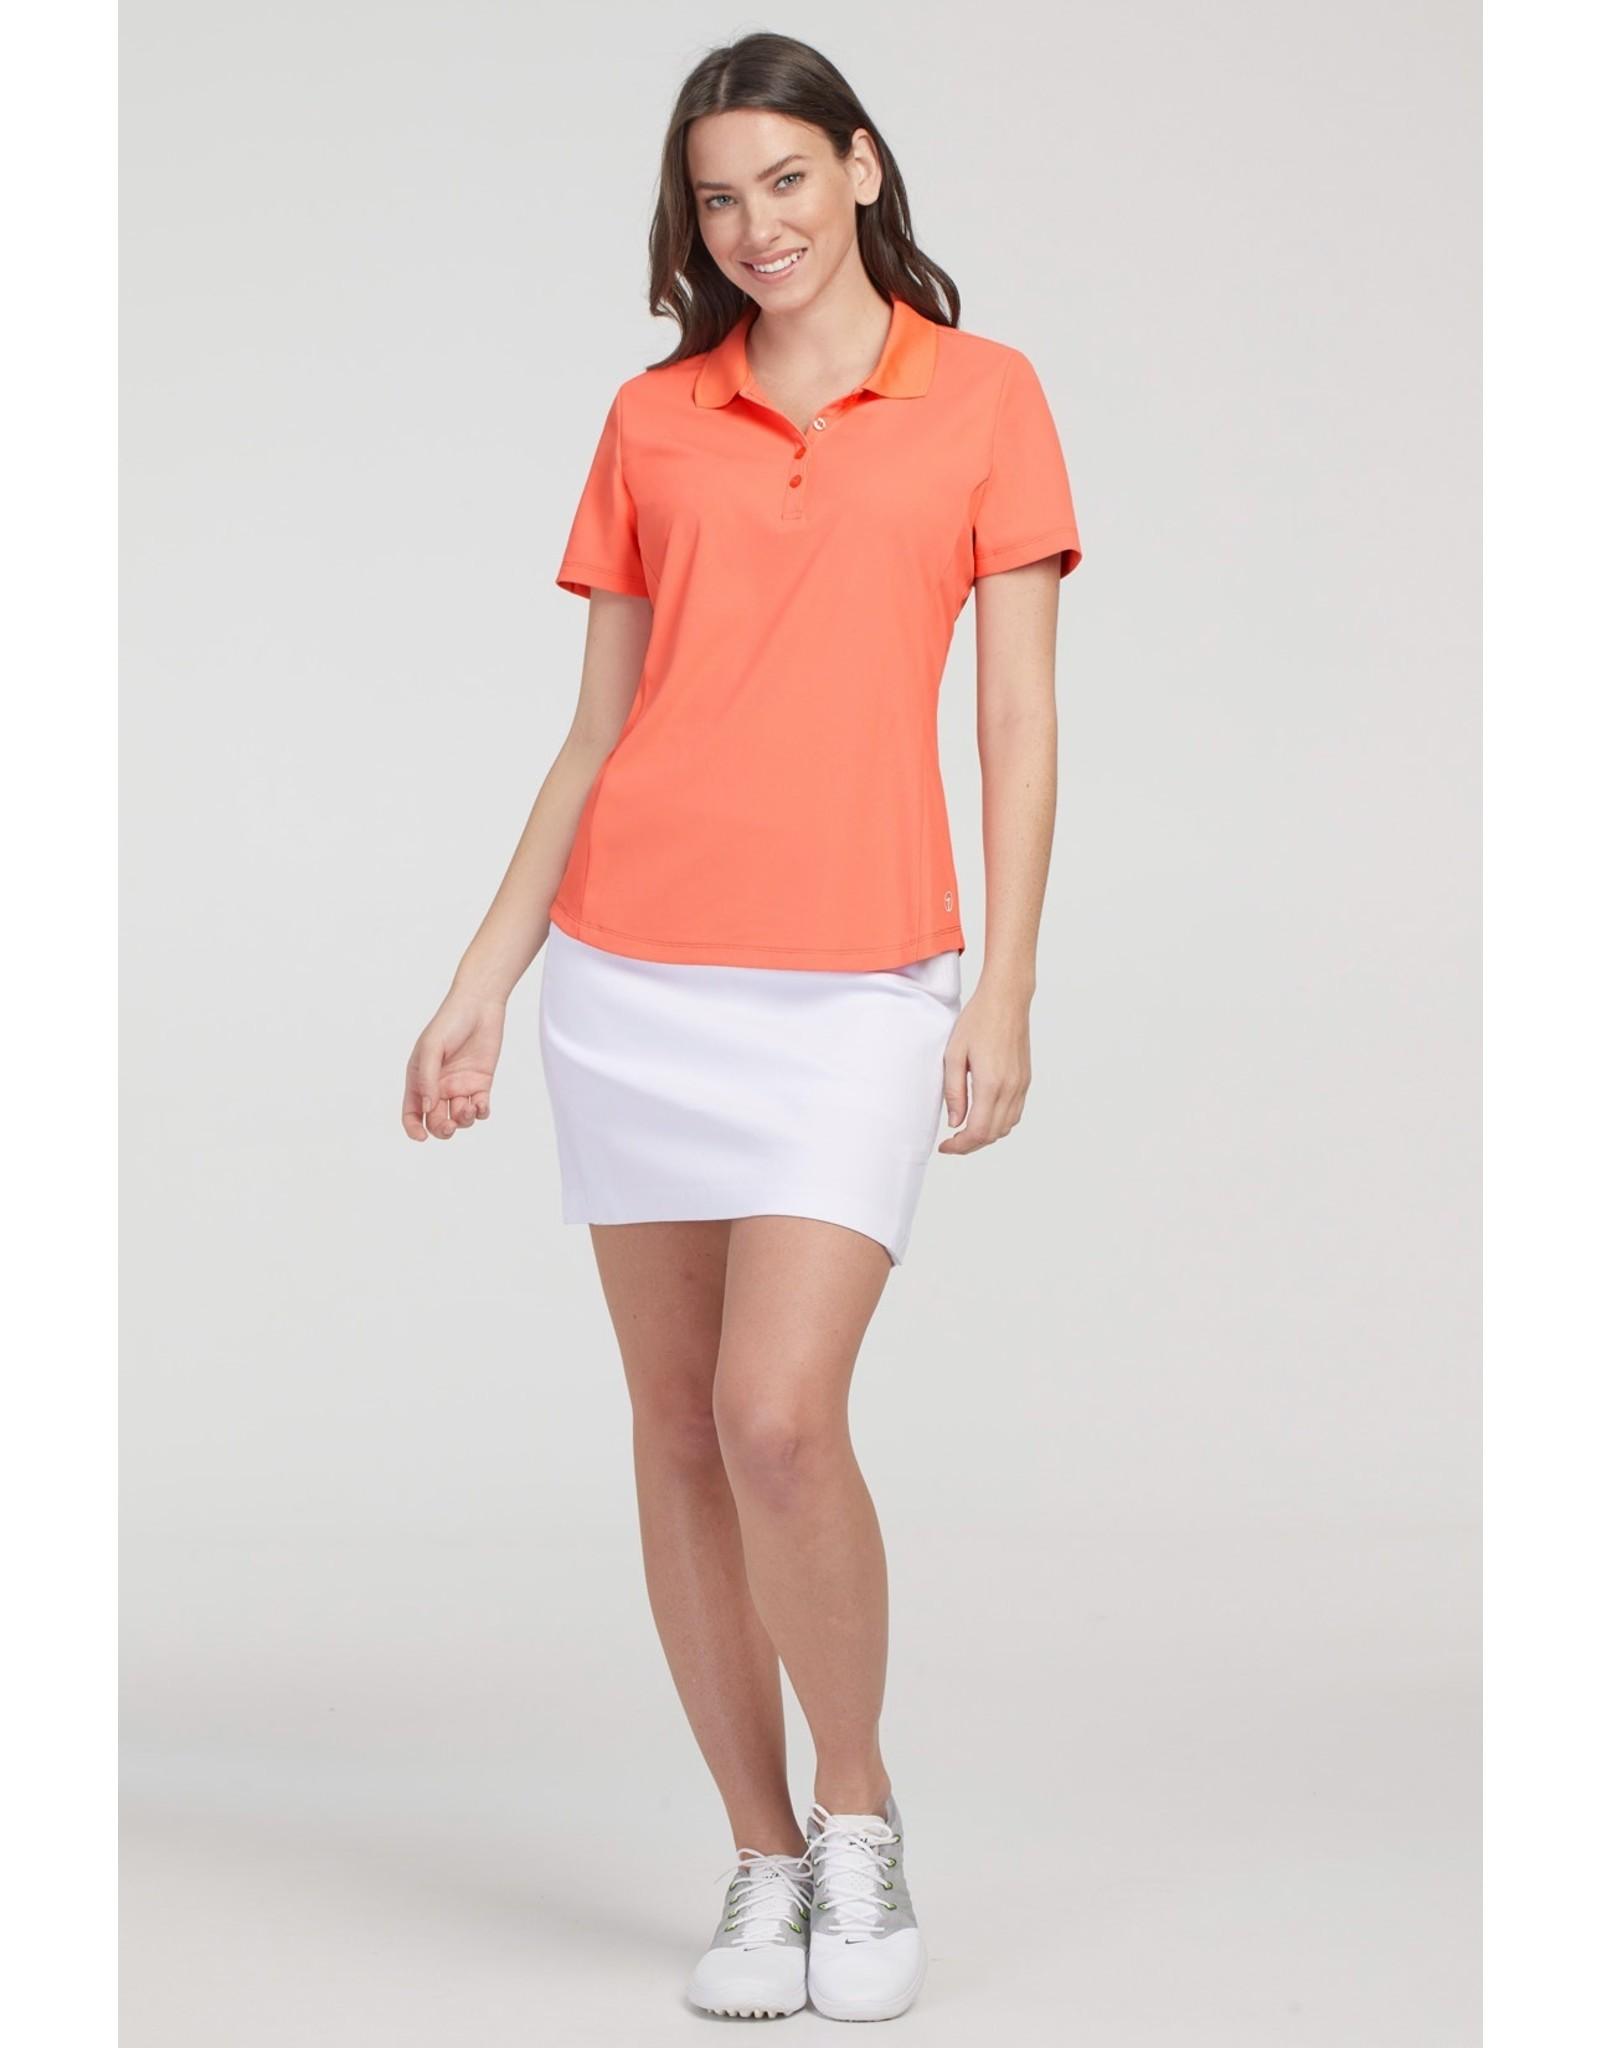 Tribal Spring Summer Polo Shirt 32370 (S1)